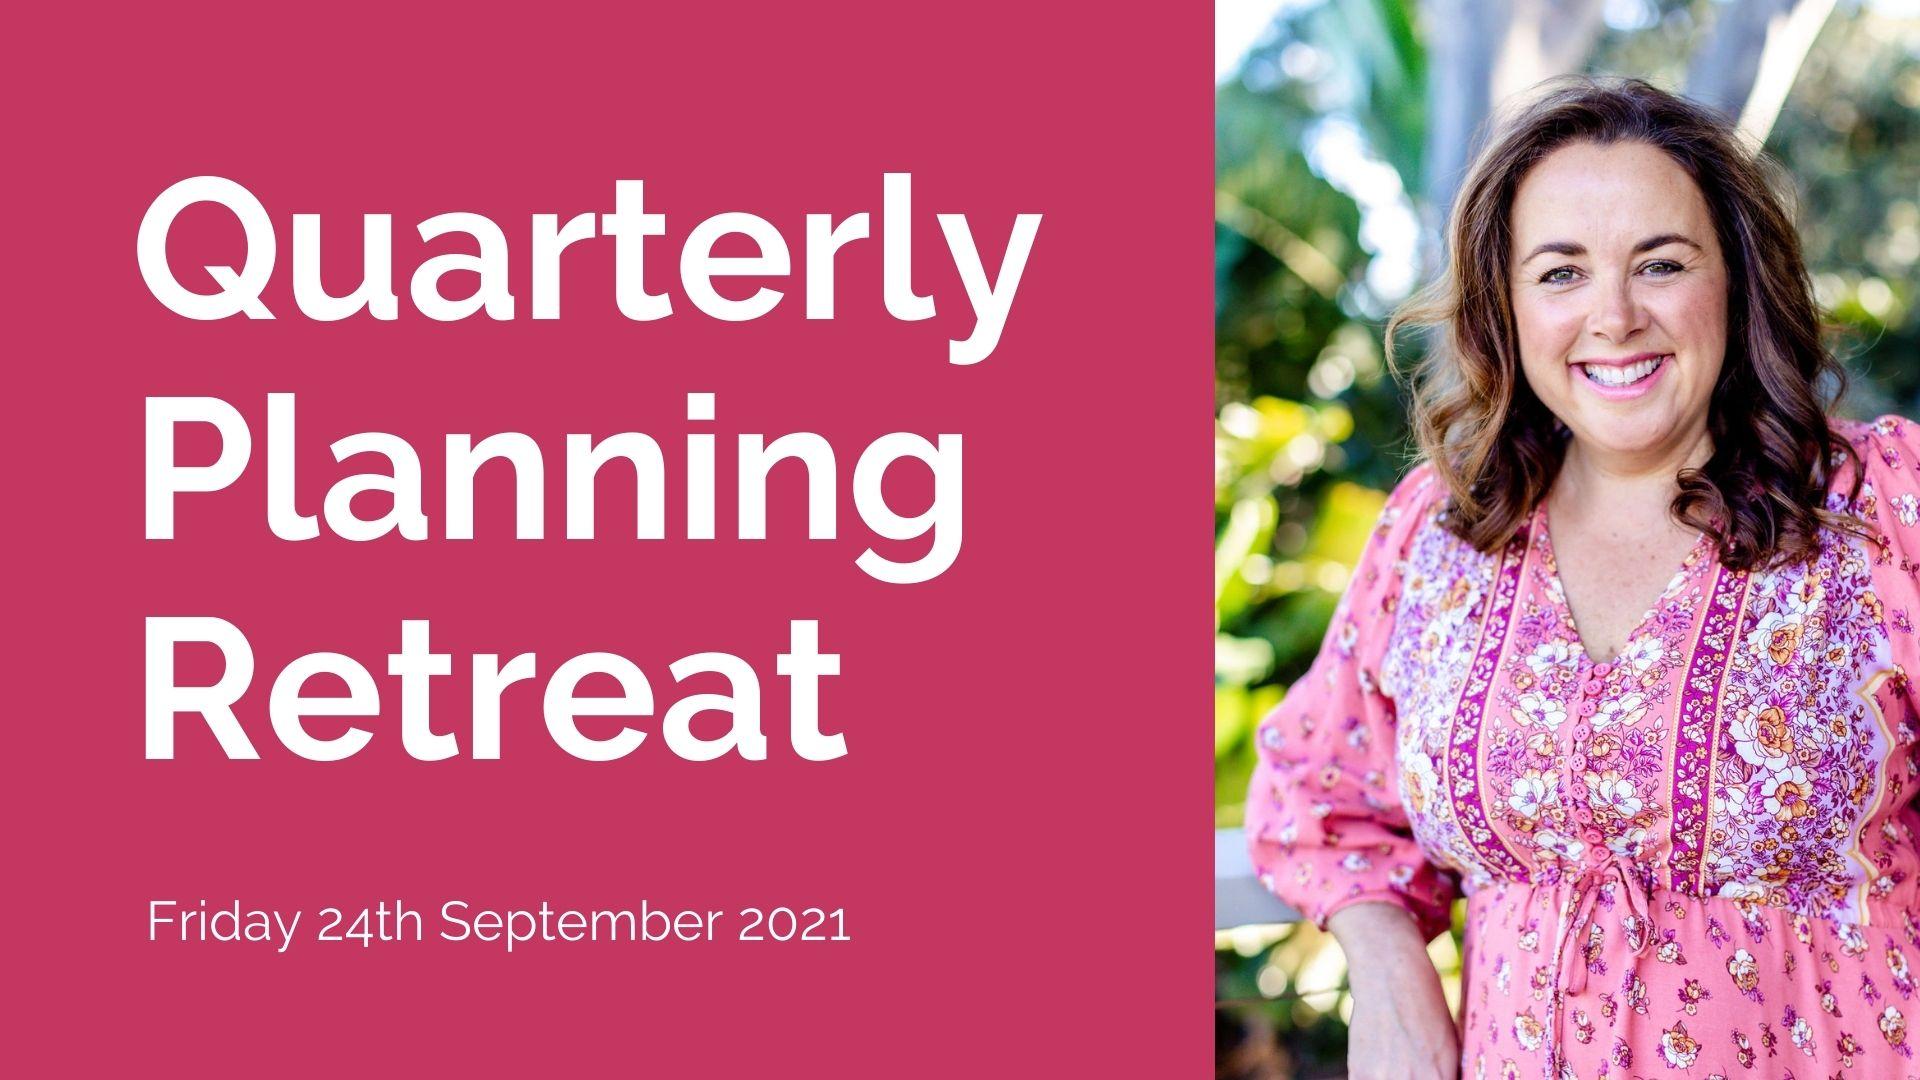 Quarterly planning retreat, Michelle Broadbent